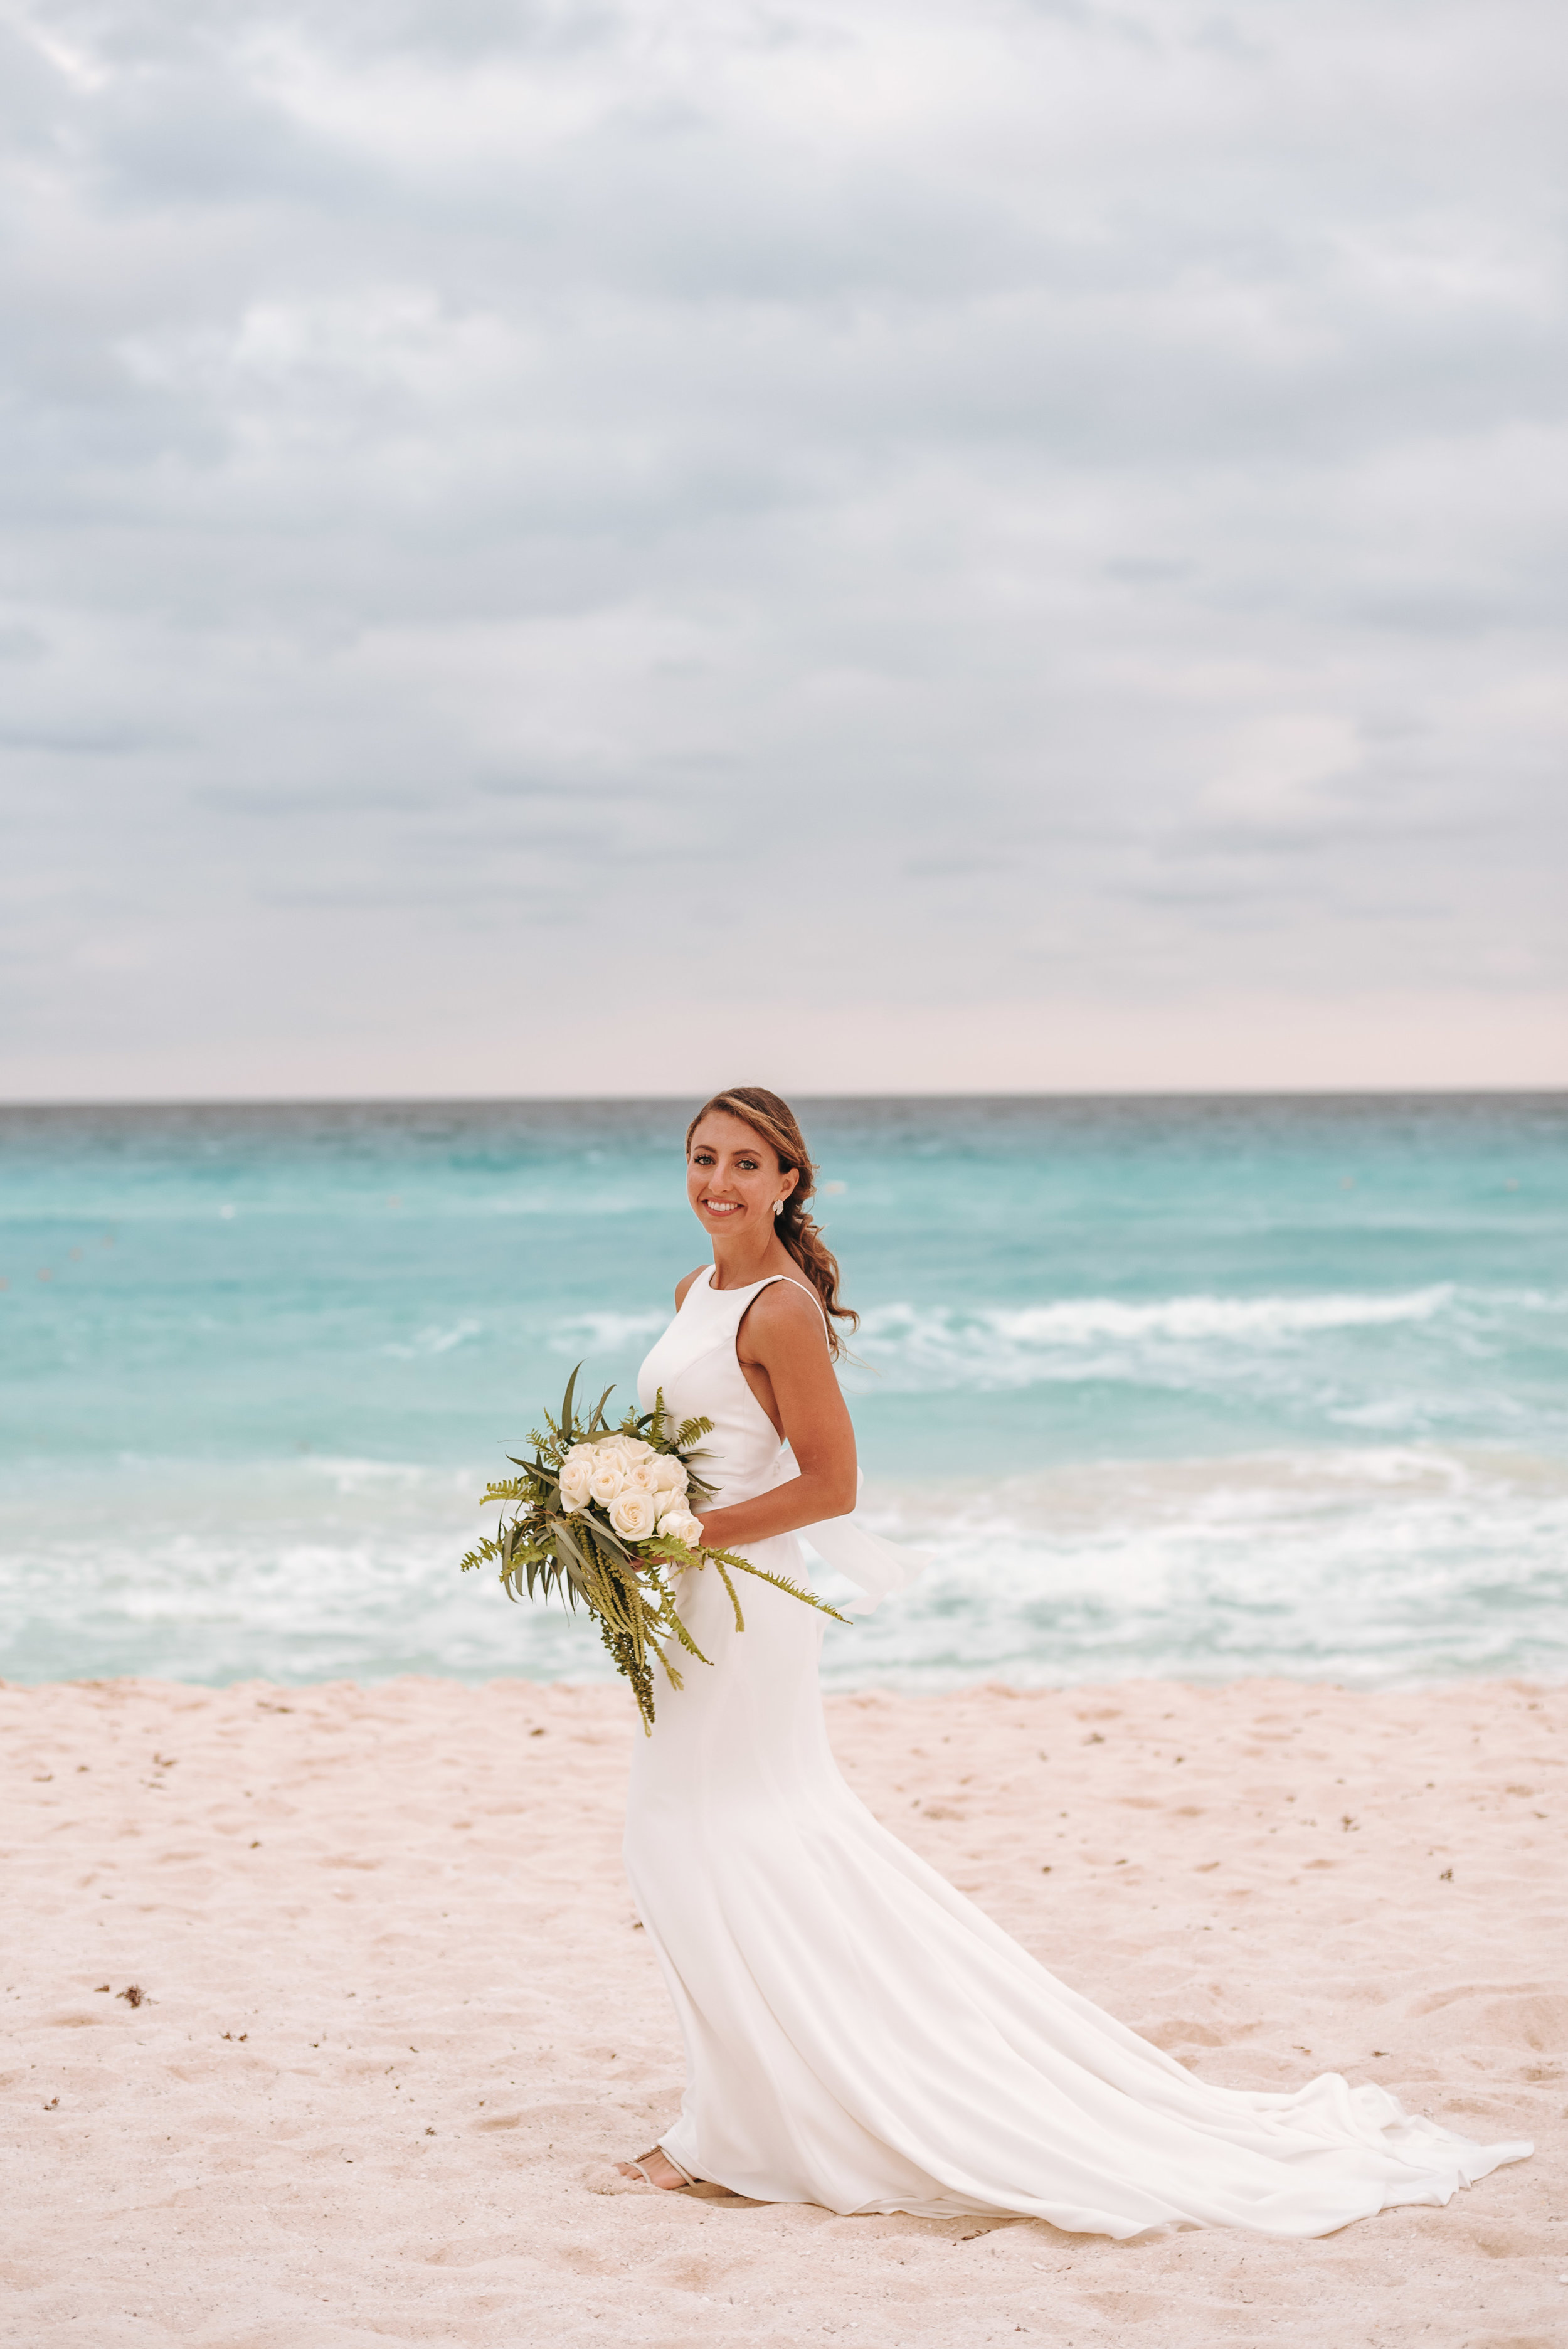 mexico_destination_wedding_ceremony-8.jpg